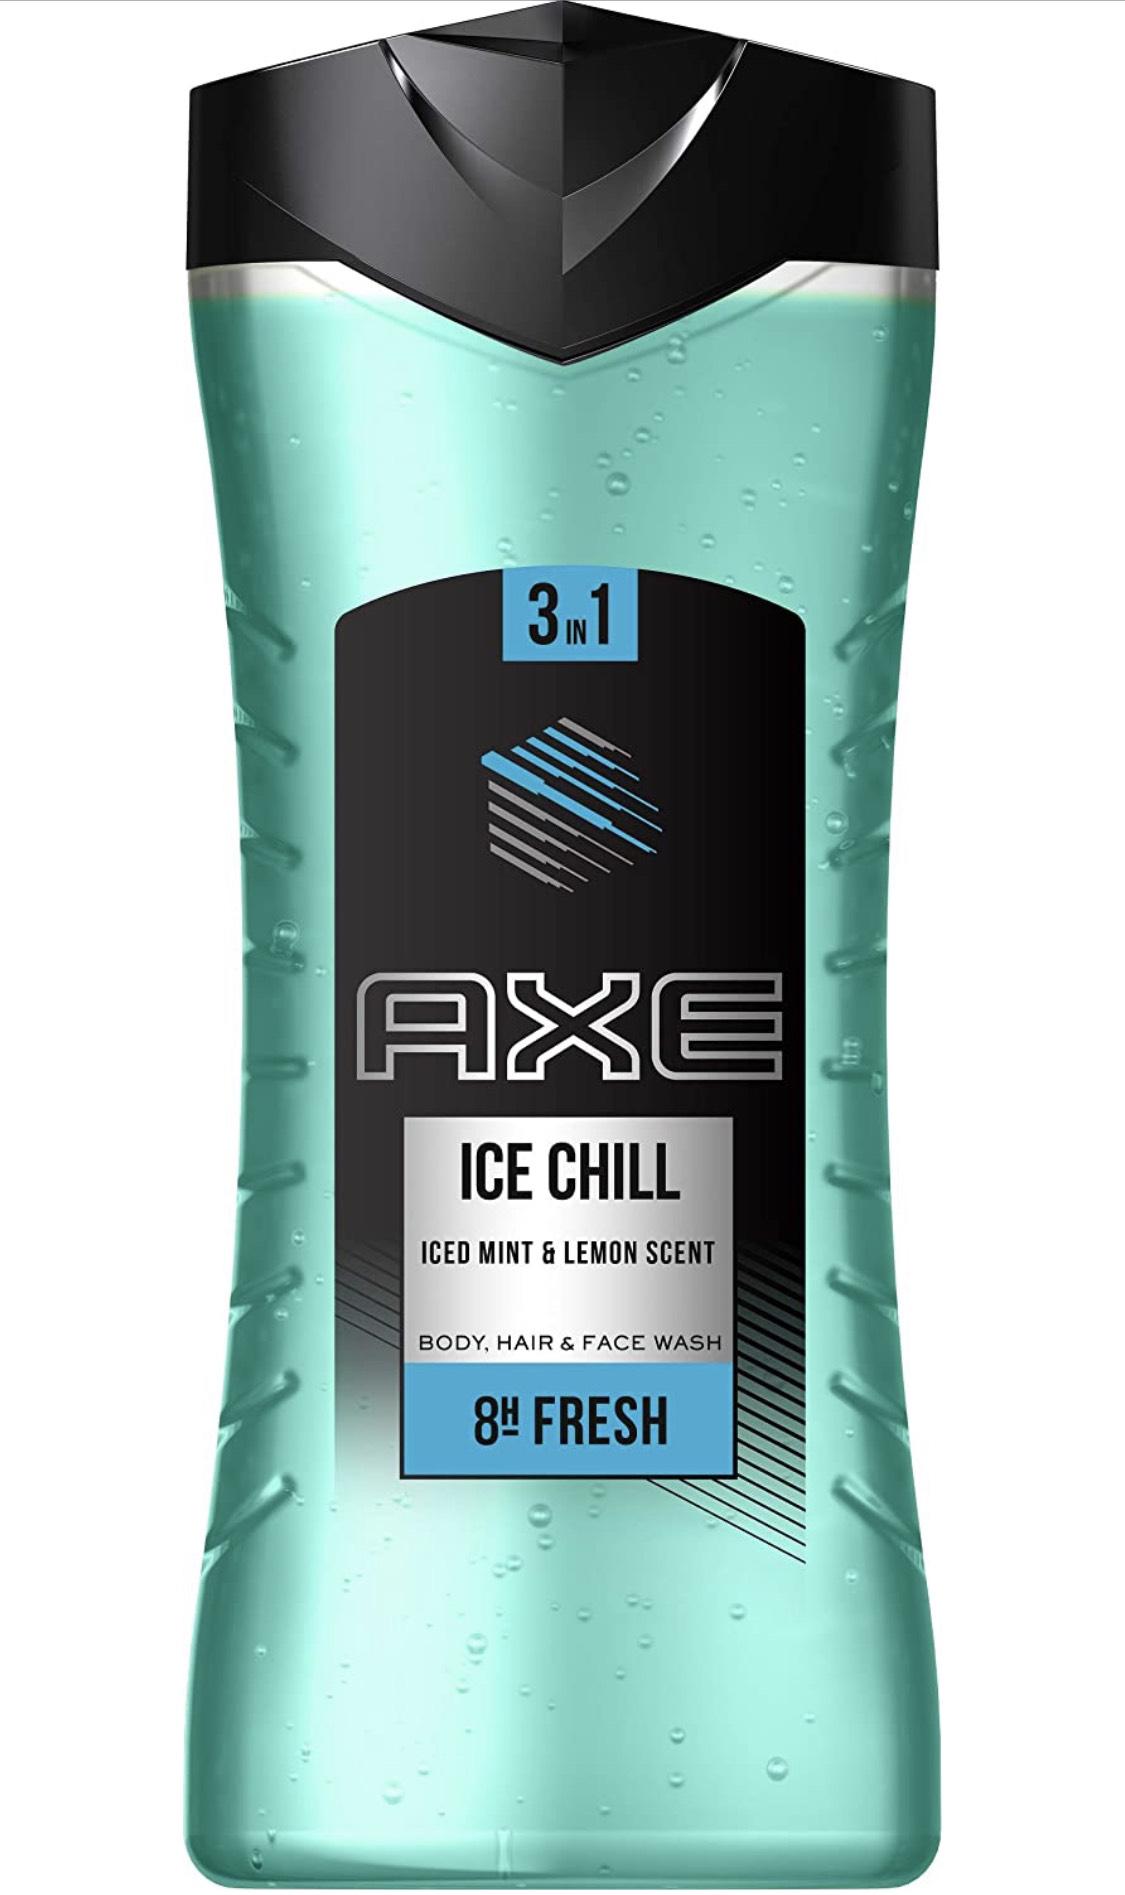 Axe Ice Chill - Duschgel, 400 ml x 6 Einheiten Preisfehler??